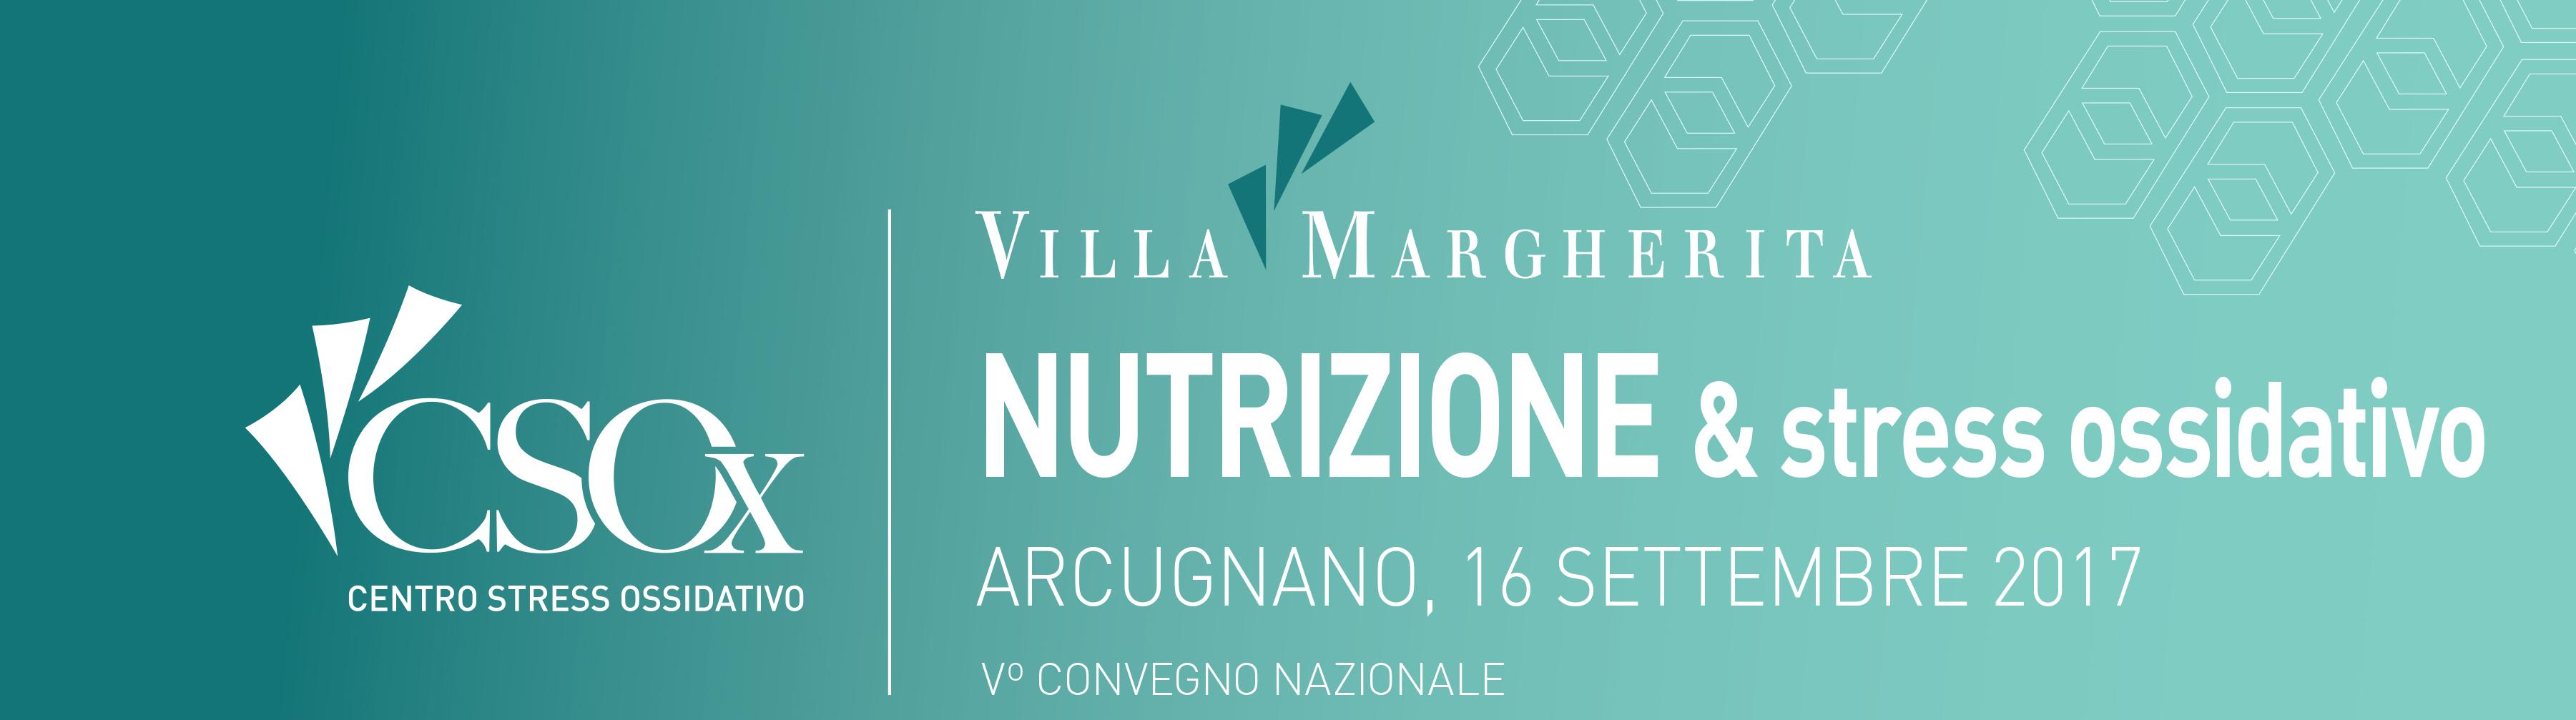 Vº Convegno Nazionale:  NUTRIZIONE & stress ossidativo